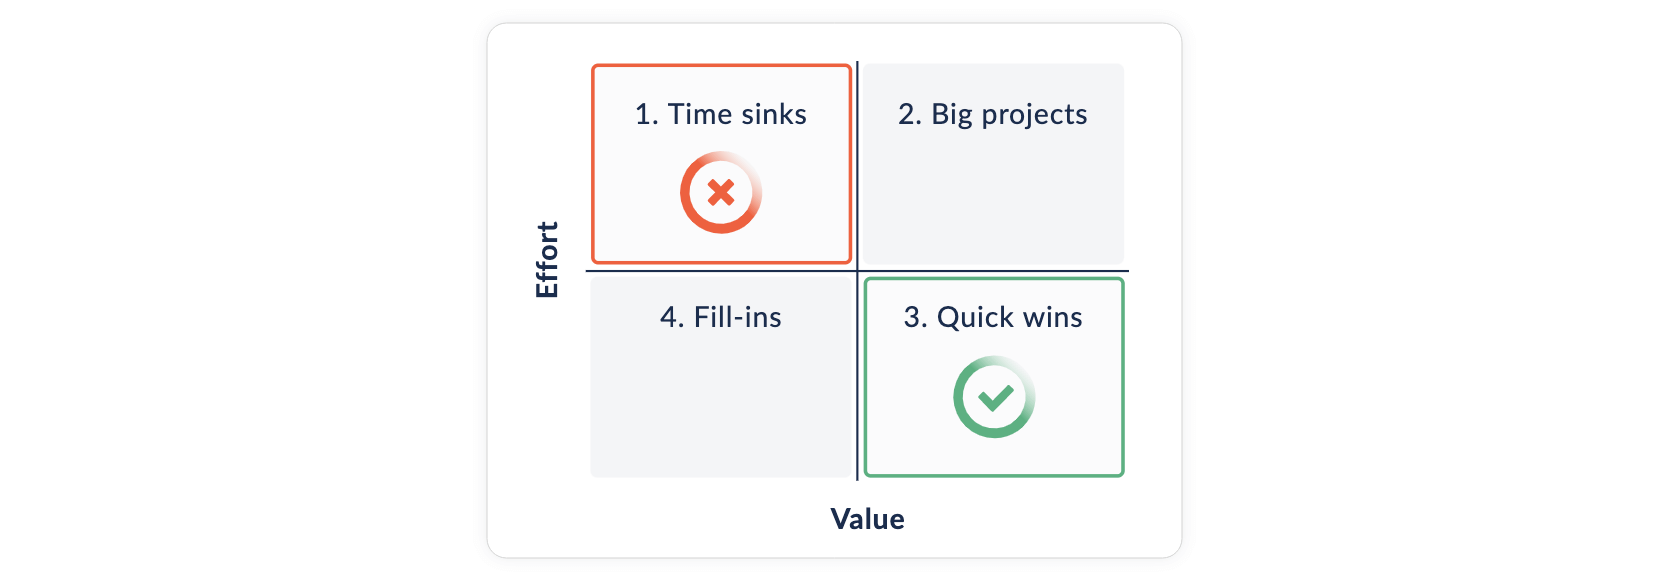 Priority matrix in Foxly with quadrants